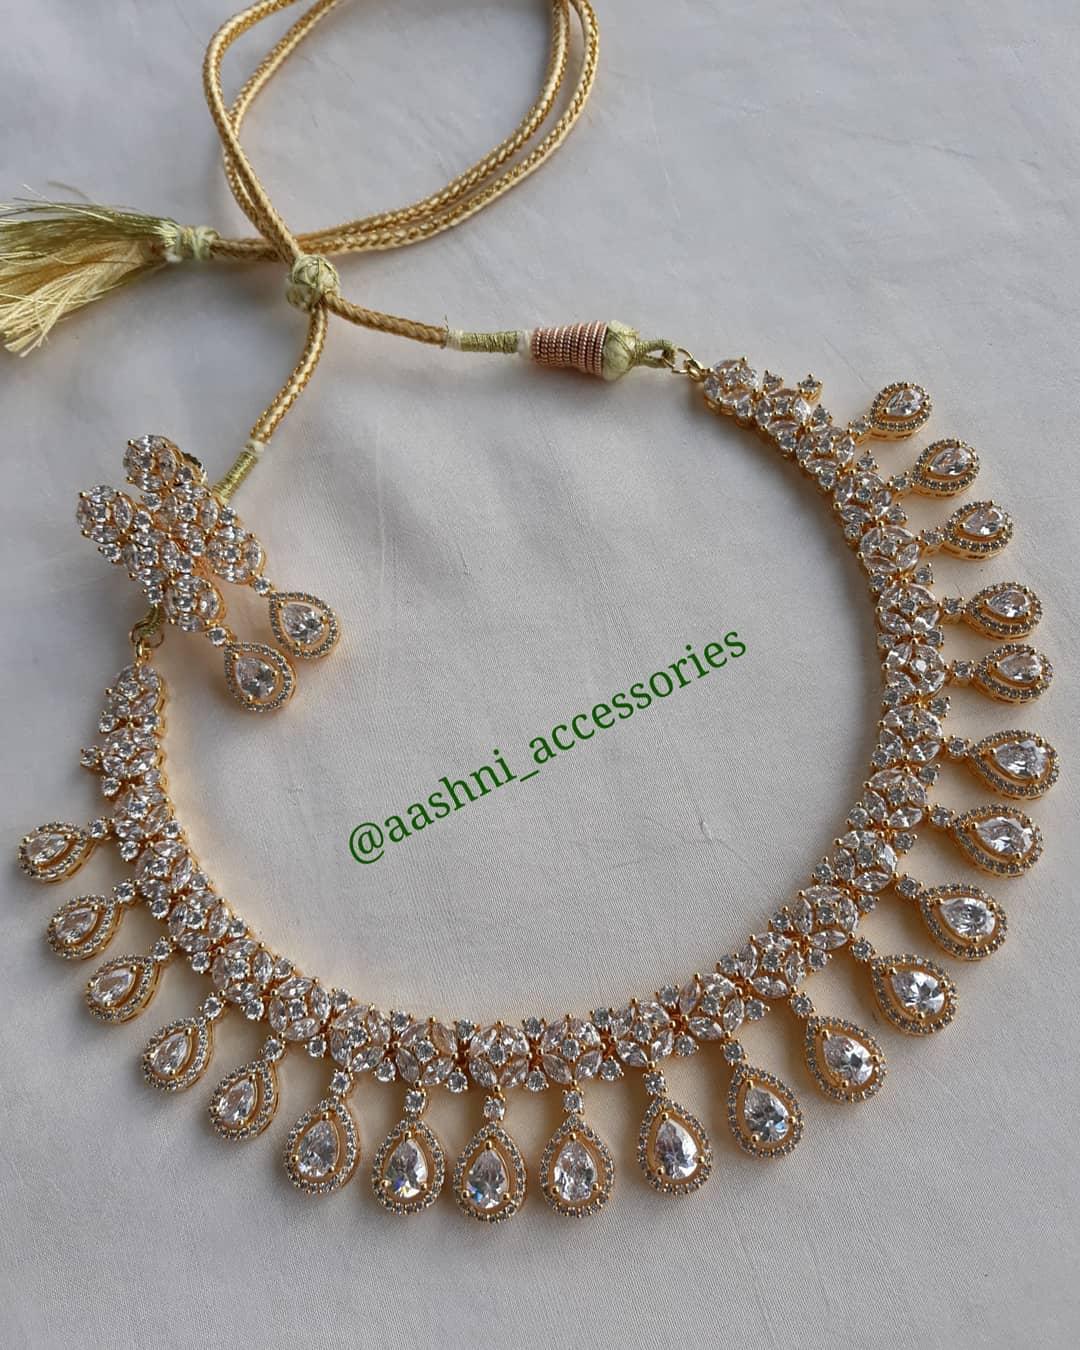 stone-necklace-designs (2)